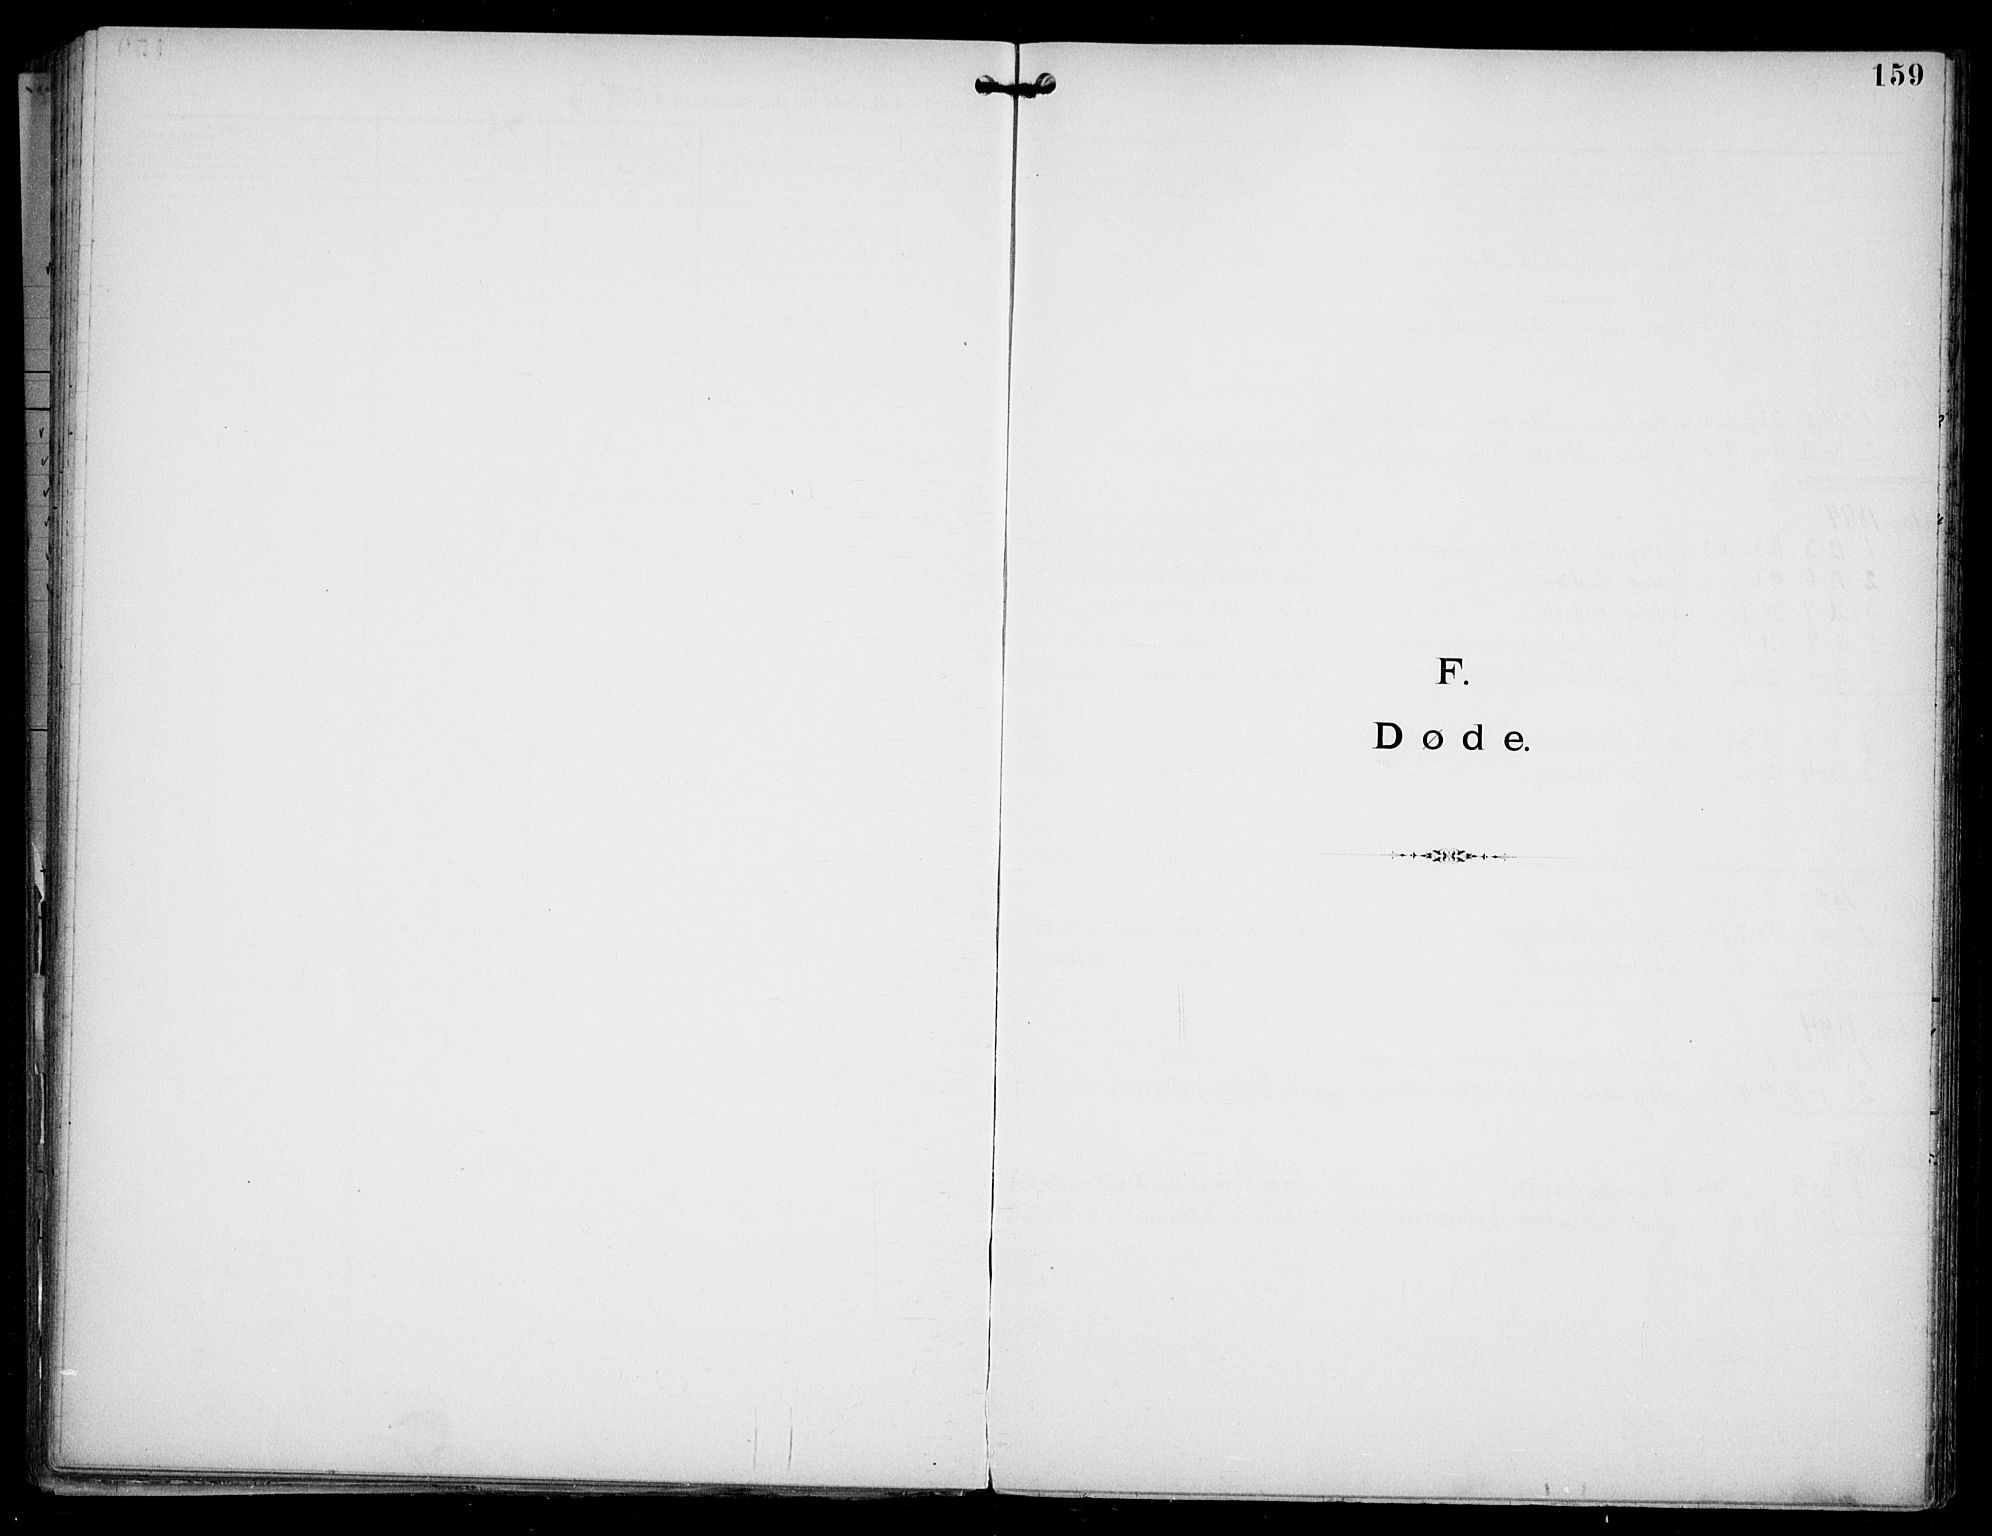 SAO, Den katolsk apostoliske menighet i Oslo , F/Fa/L0002: Dissenterprotokoll nr. 2, 1892-1937, s. 159